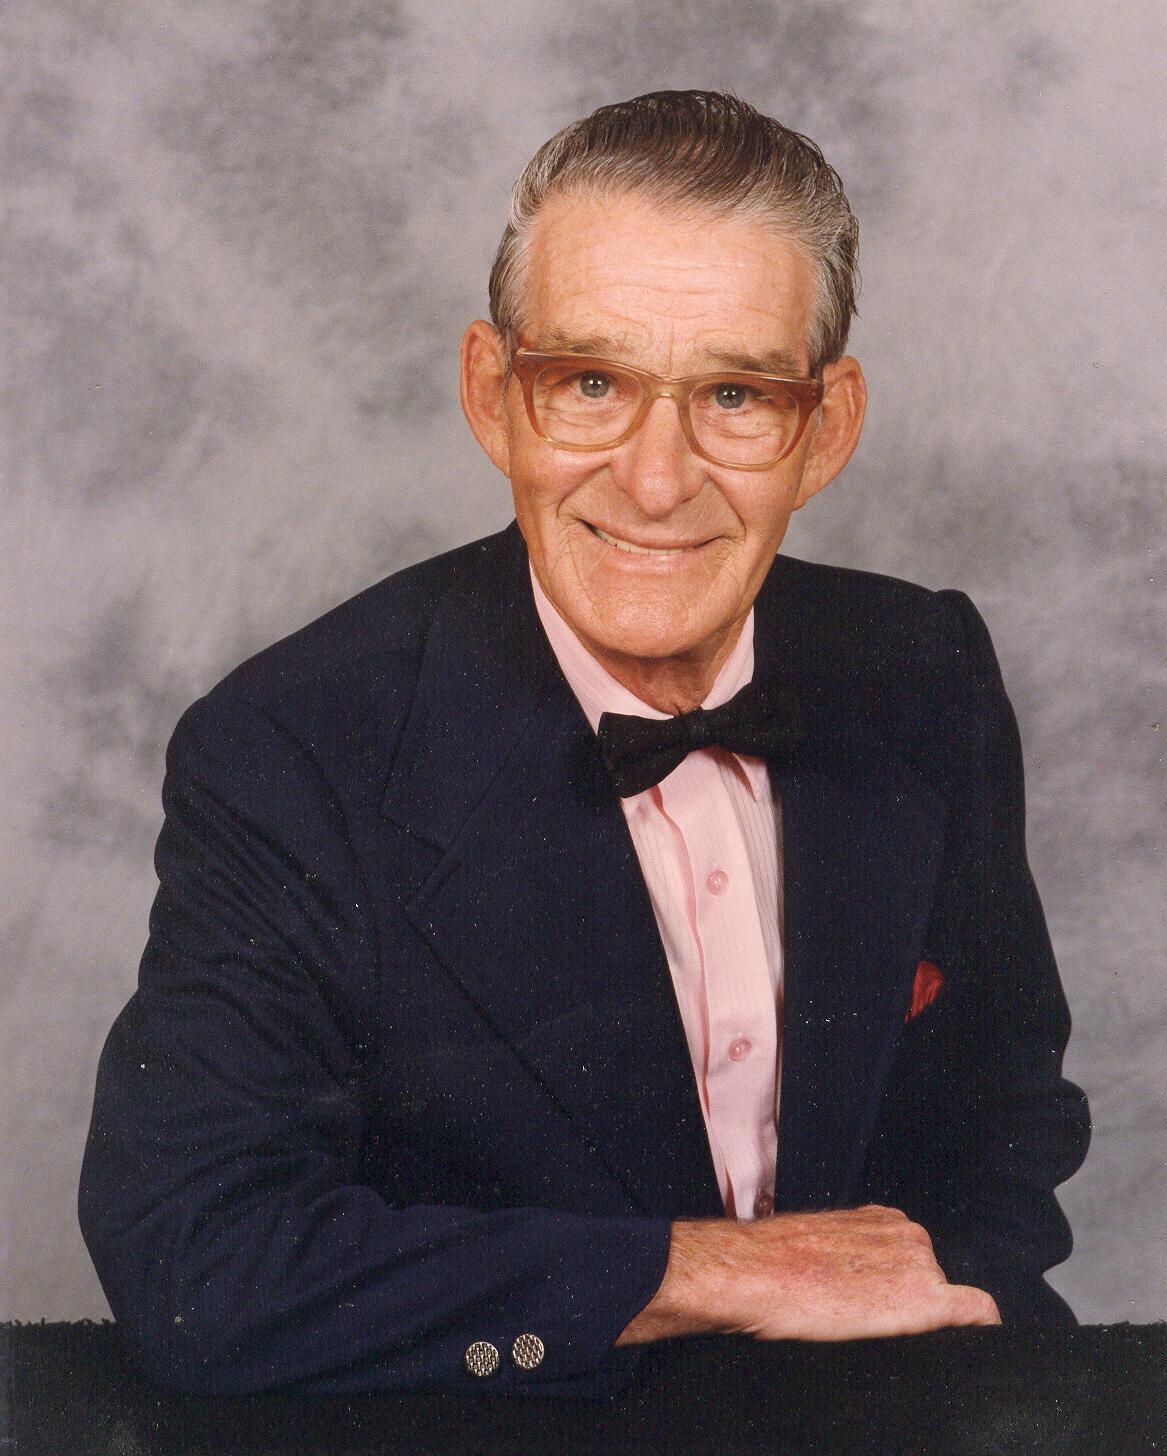 Jay Wesley Kohr